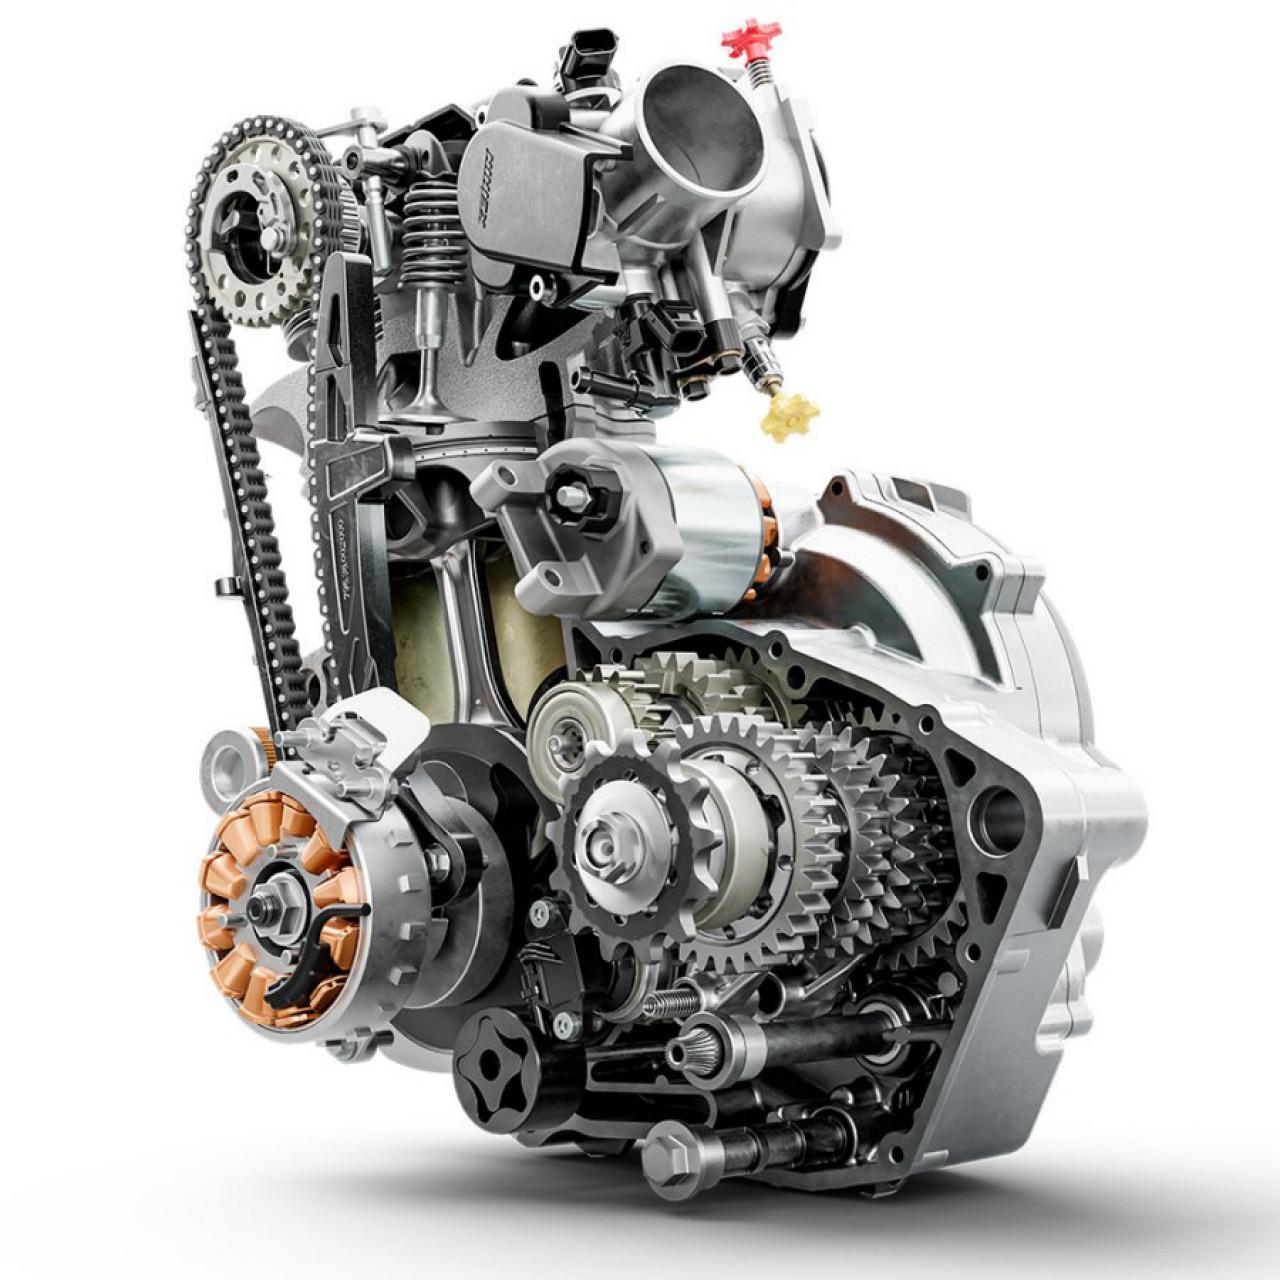 KTM 450 SX-F 2021 - Image 3